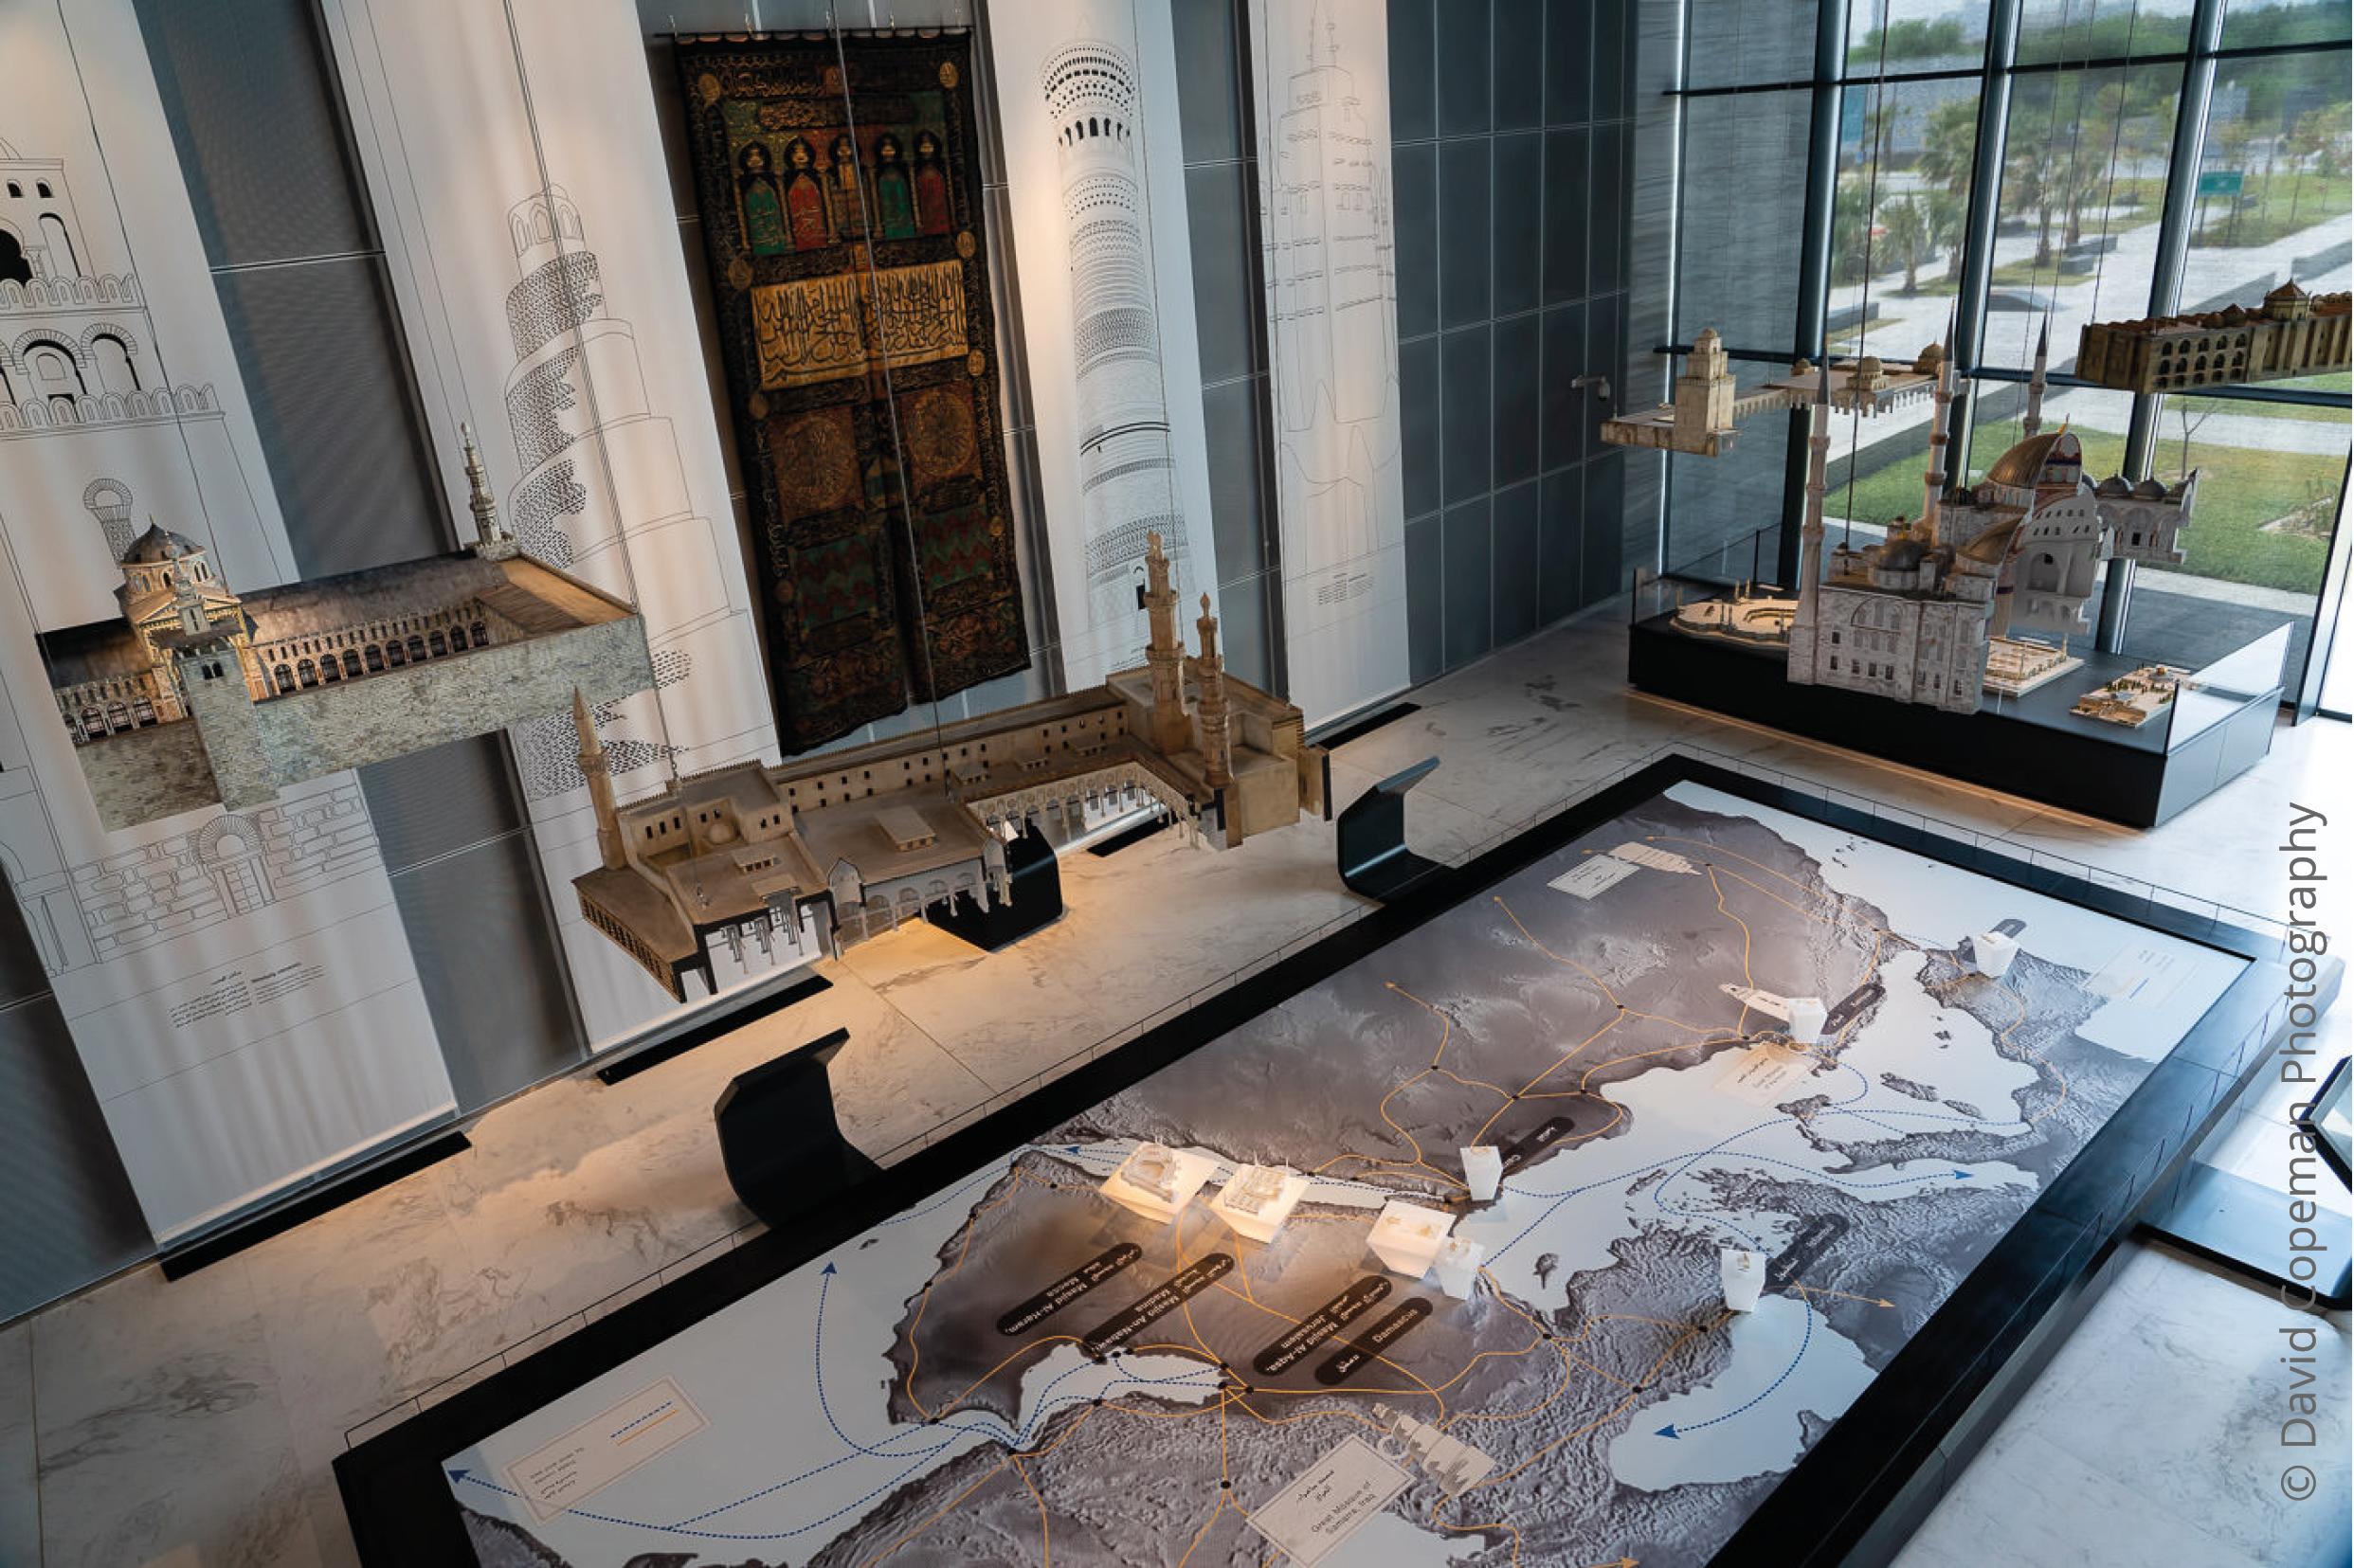 Sheikh Abdullah Al Salem Cultural Centre Arabic Islamic Science gallery © David Copeman Photography